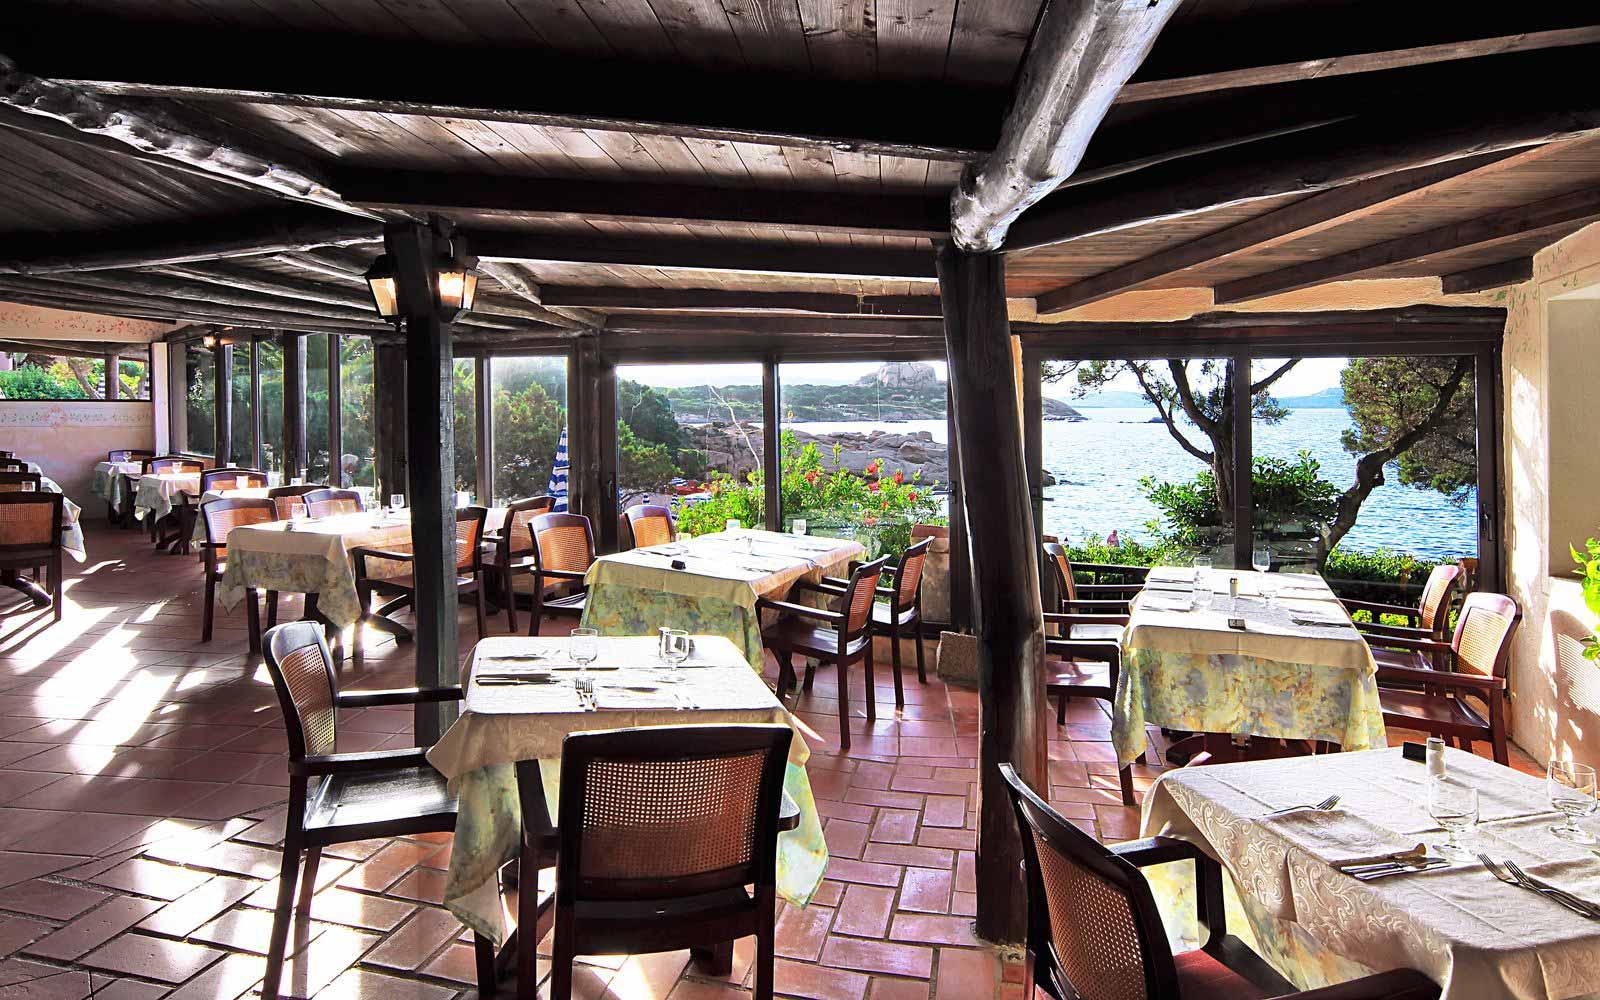 Pagoda Restaurant at Grand Hotel Smeraldo Beach